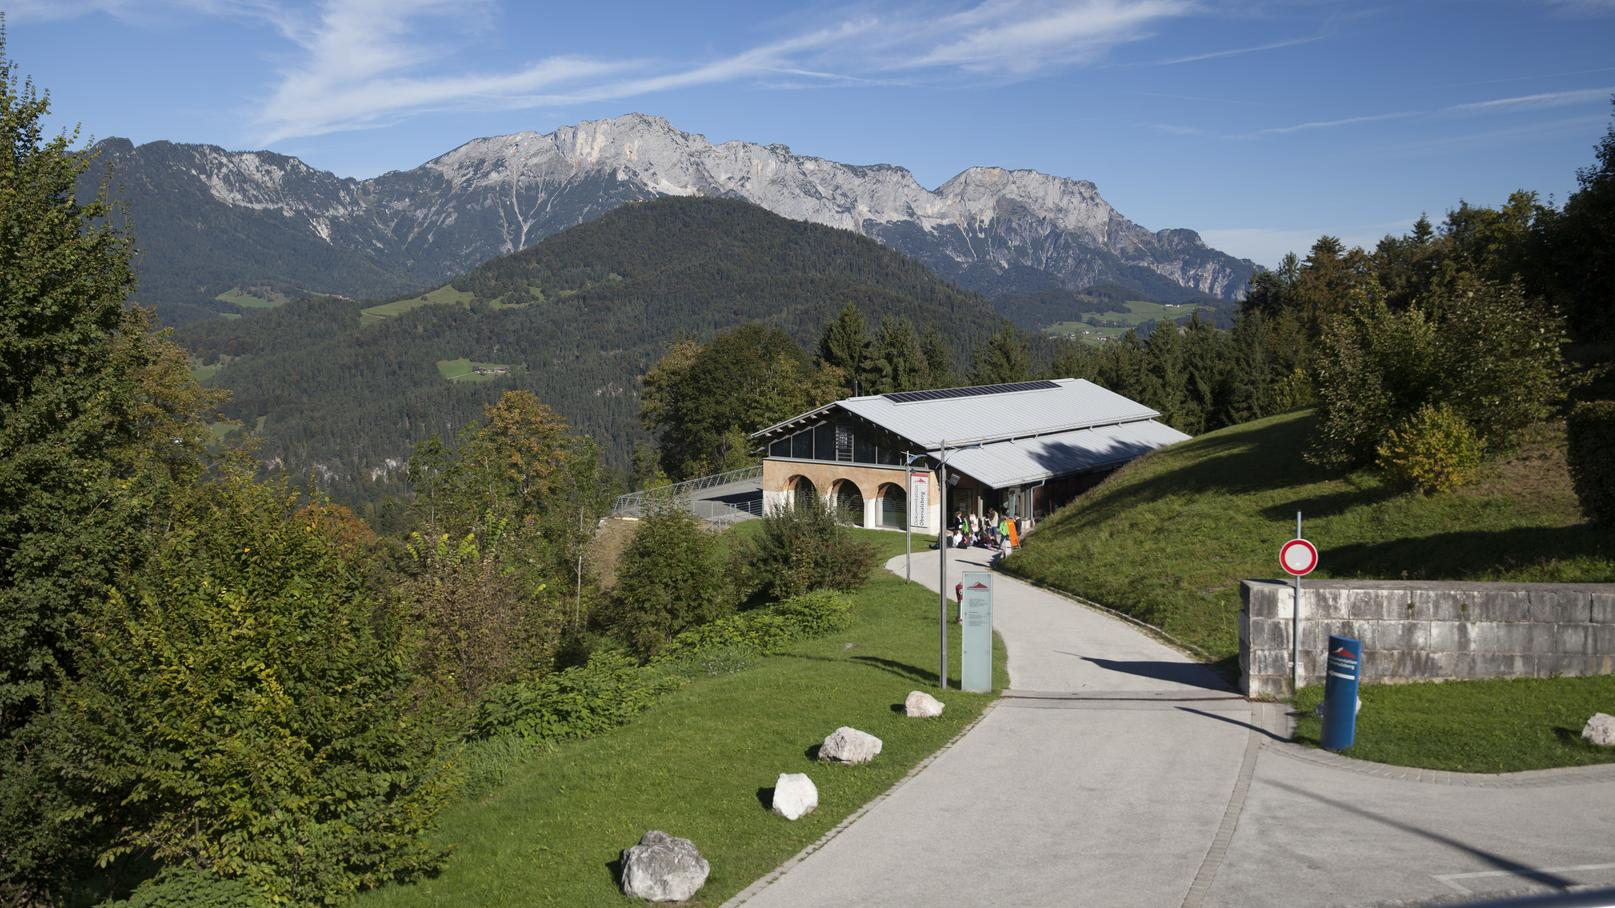 NS-Dokuzentrum Obersalzberg